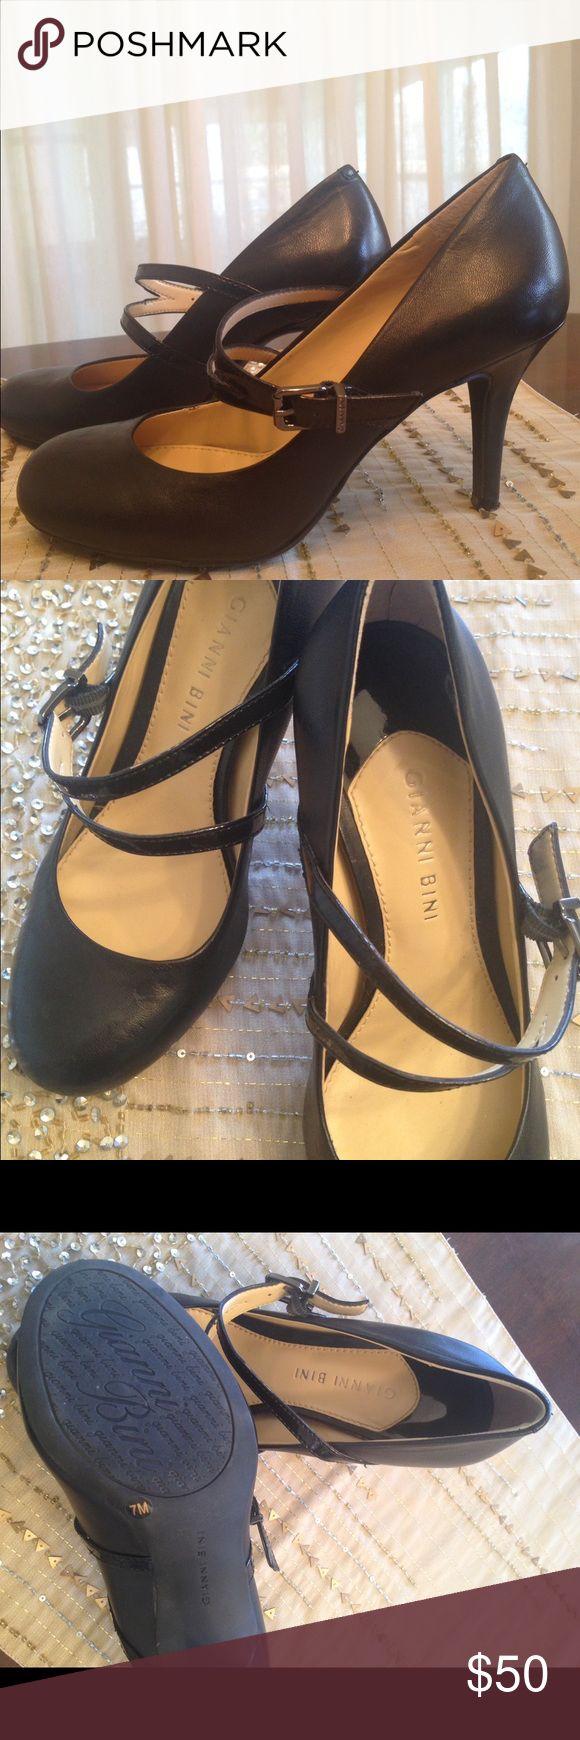 Gianni Bini leather heels. Like new! Black, leather Gianni Bini heels. Like new in excellent condition. Size 7. Gianni Bini Shoes Heels